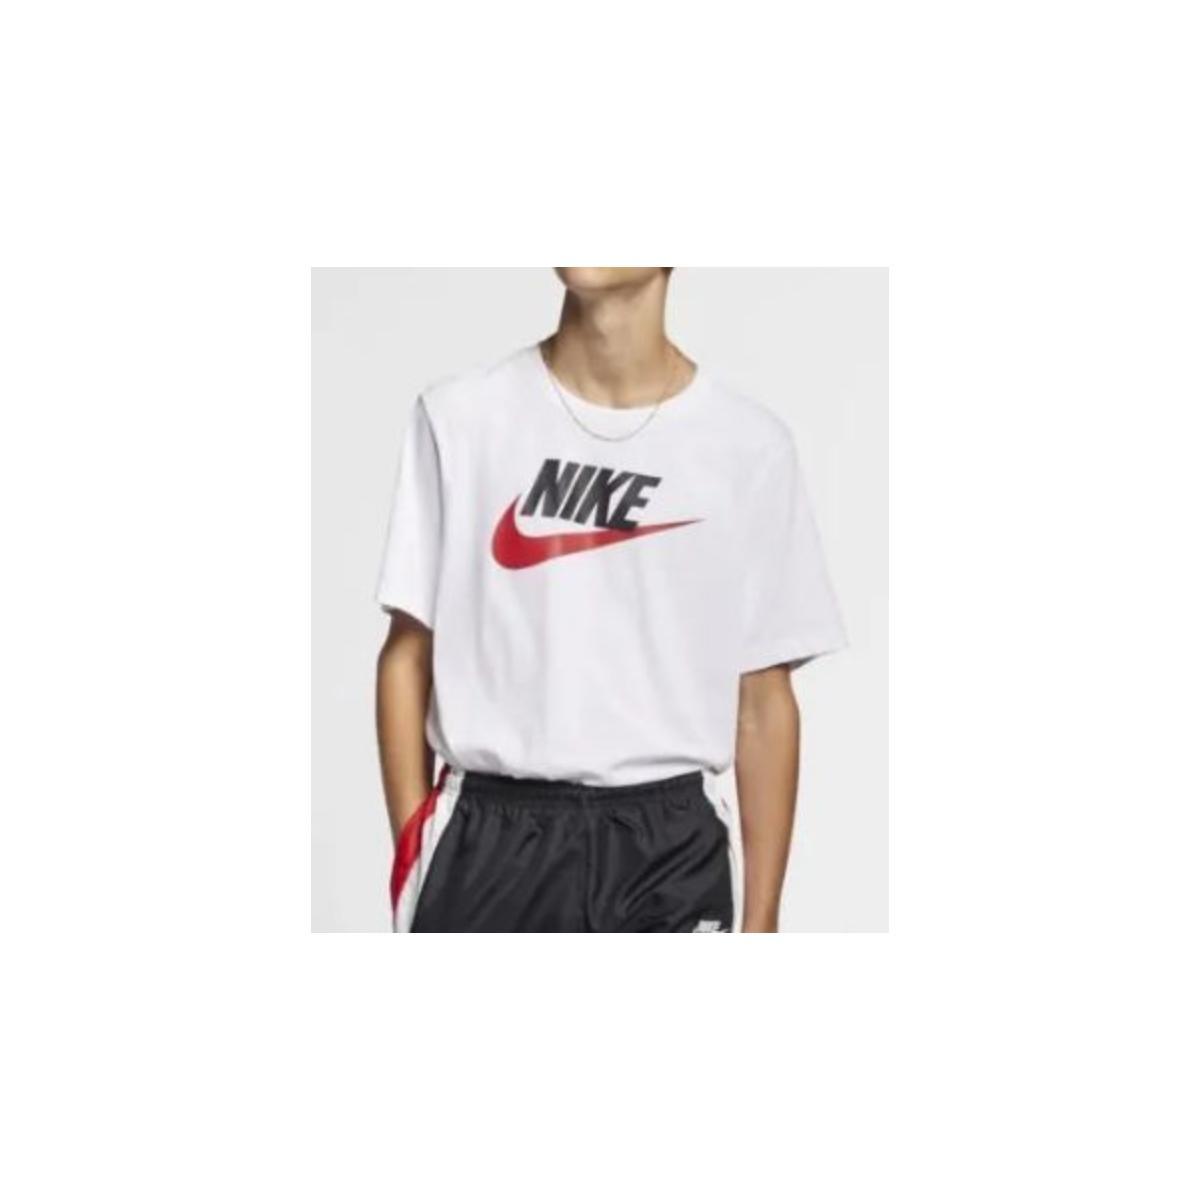 Camiseta Masculina Nike Ar5004-100 Sportwear Branco/preto